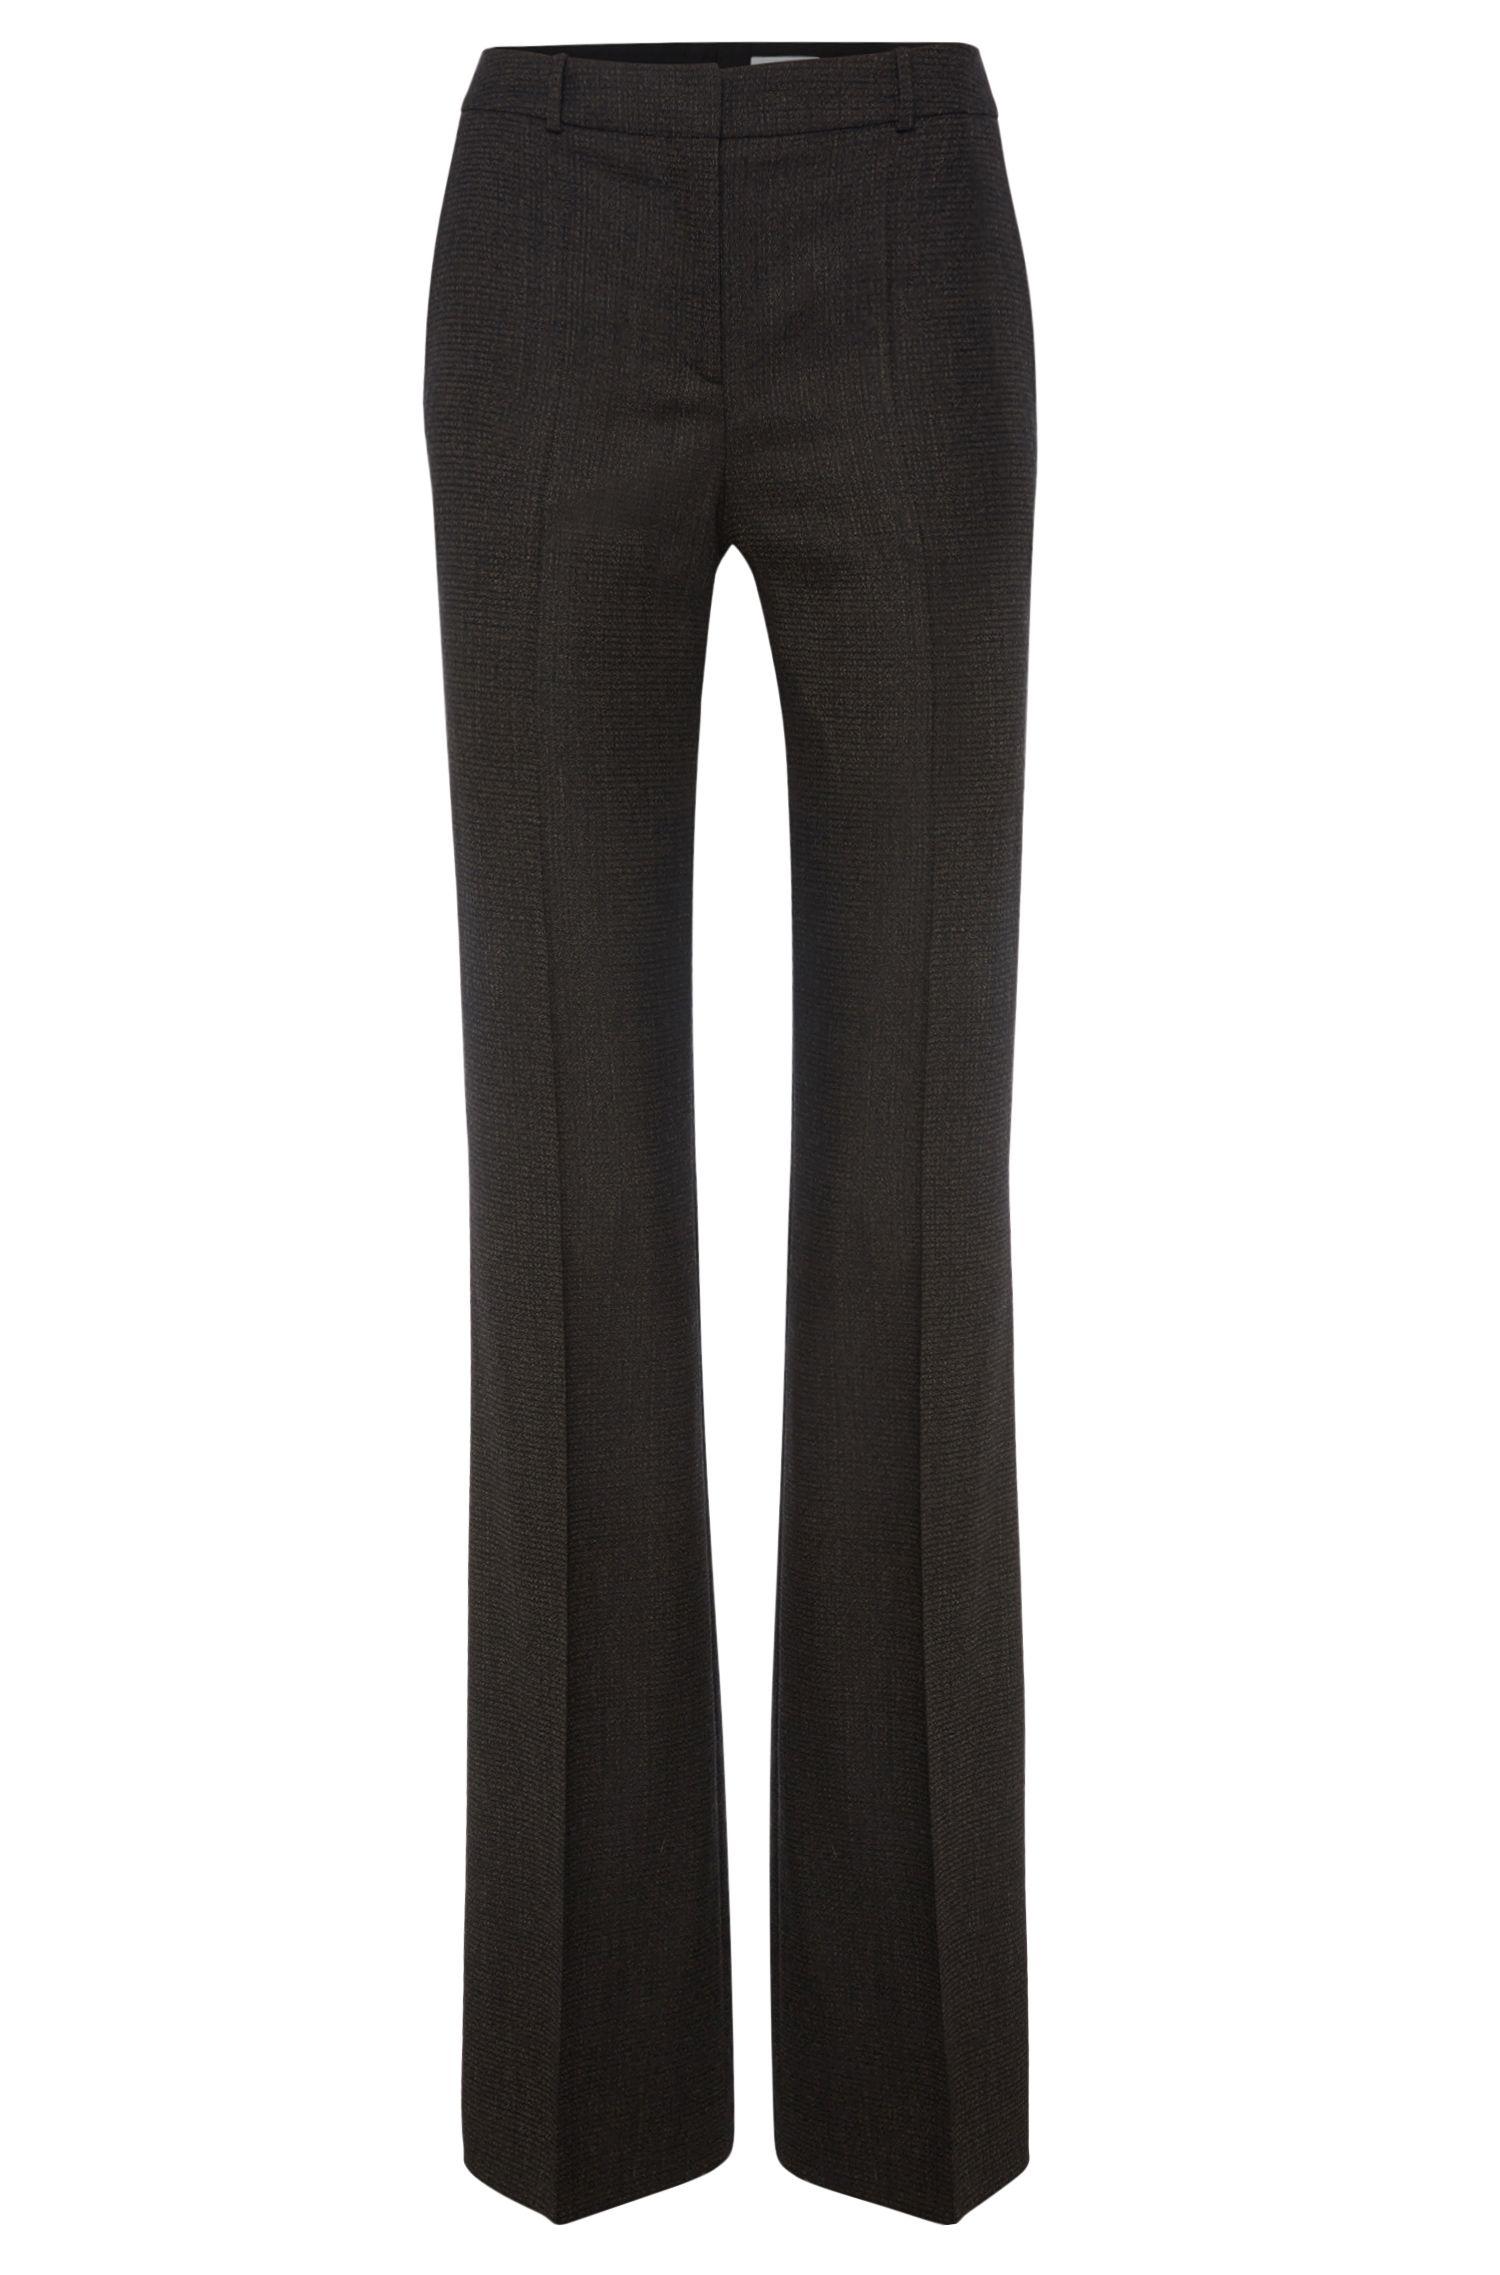 'Tusini' | Stretch Virgin Wool Tweed Dress Pants